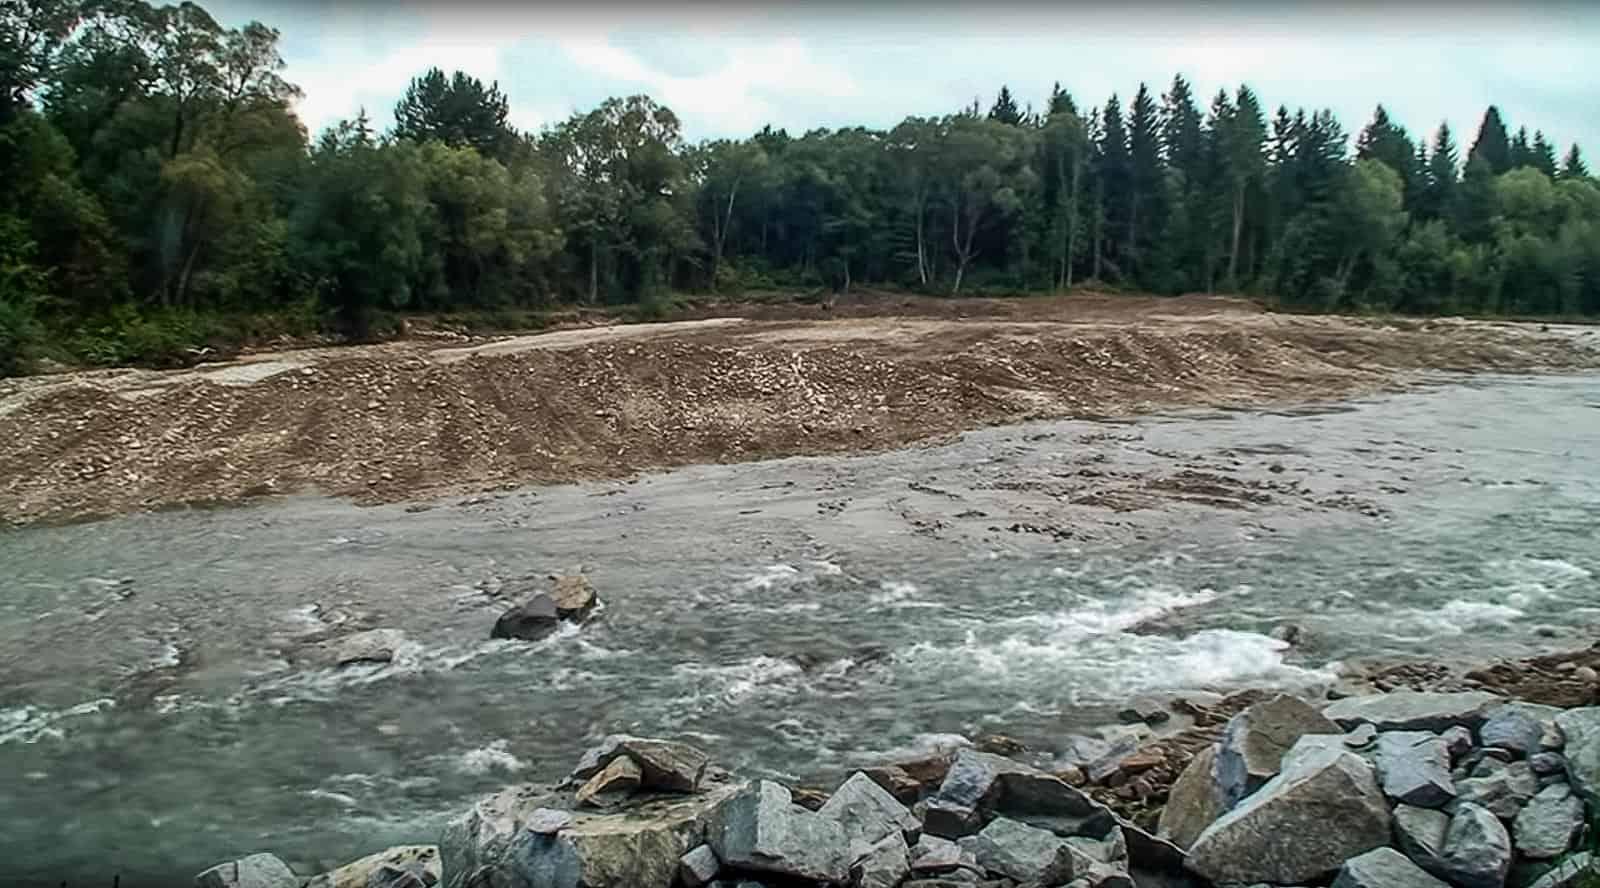 Bella River Destruction © All rights reserved